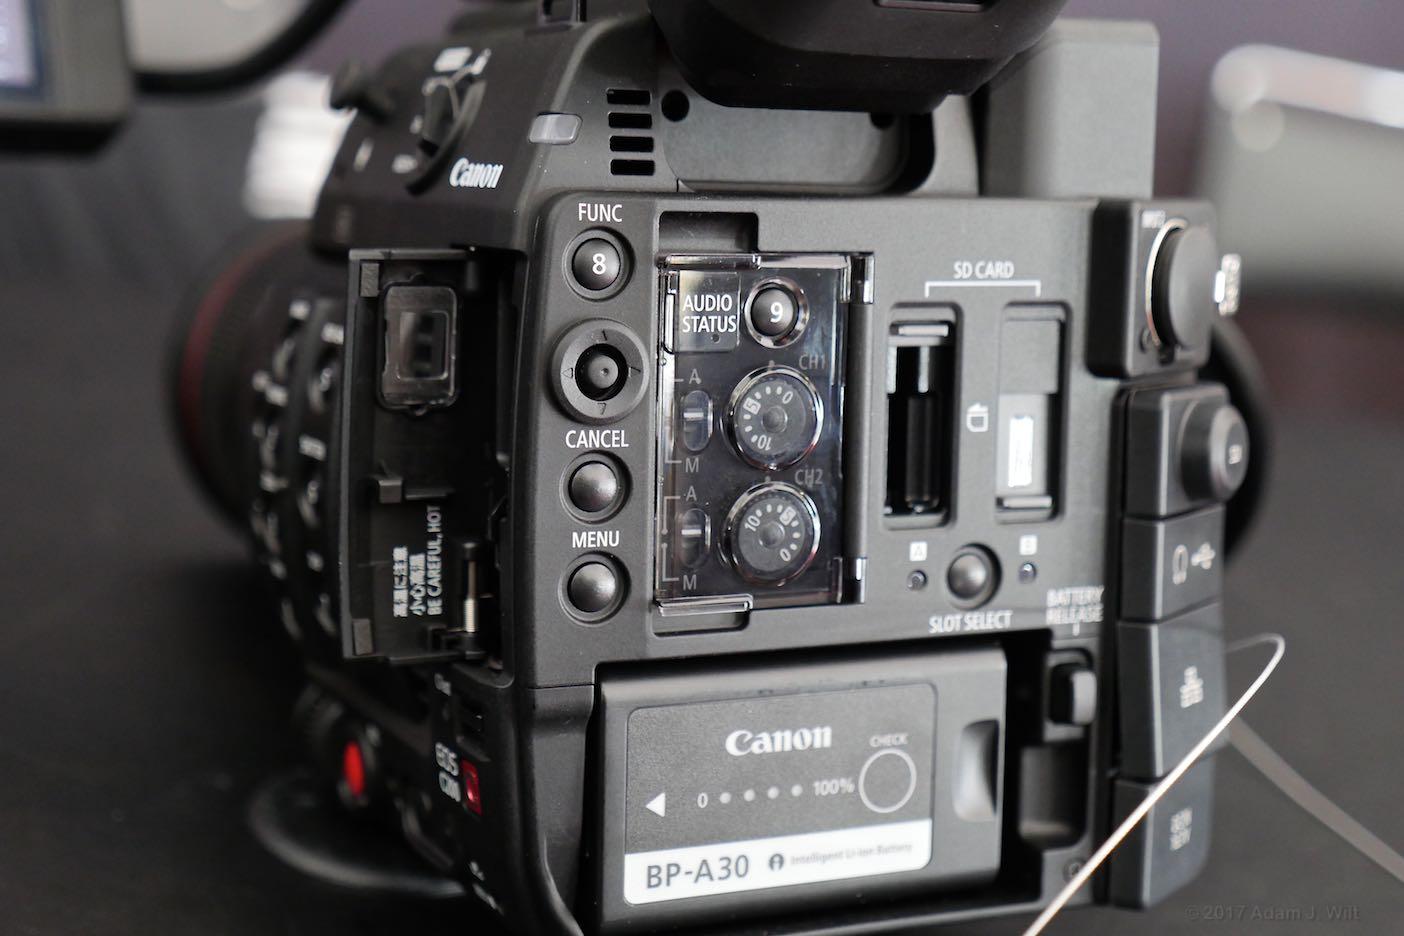 C200 rear panel